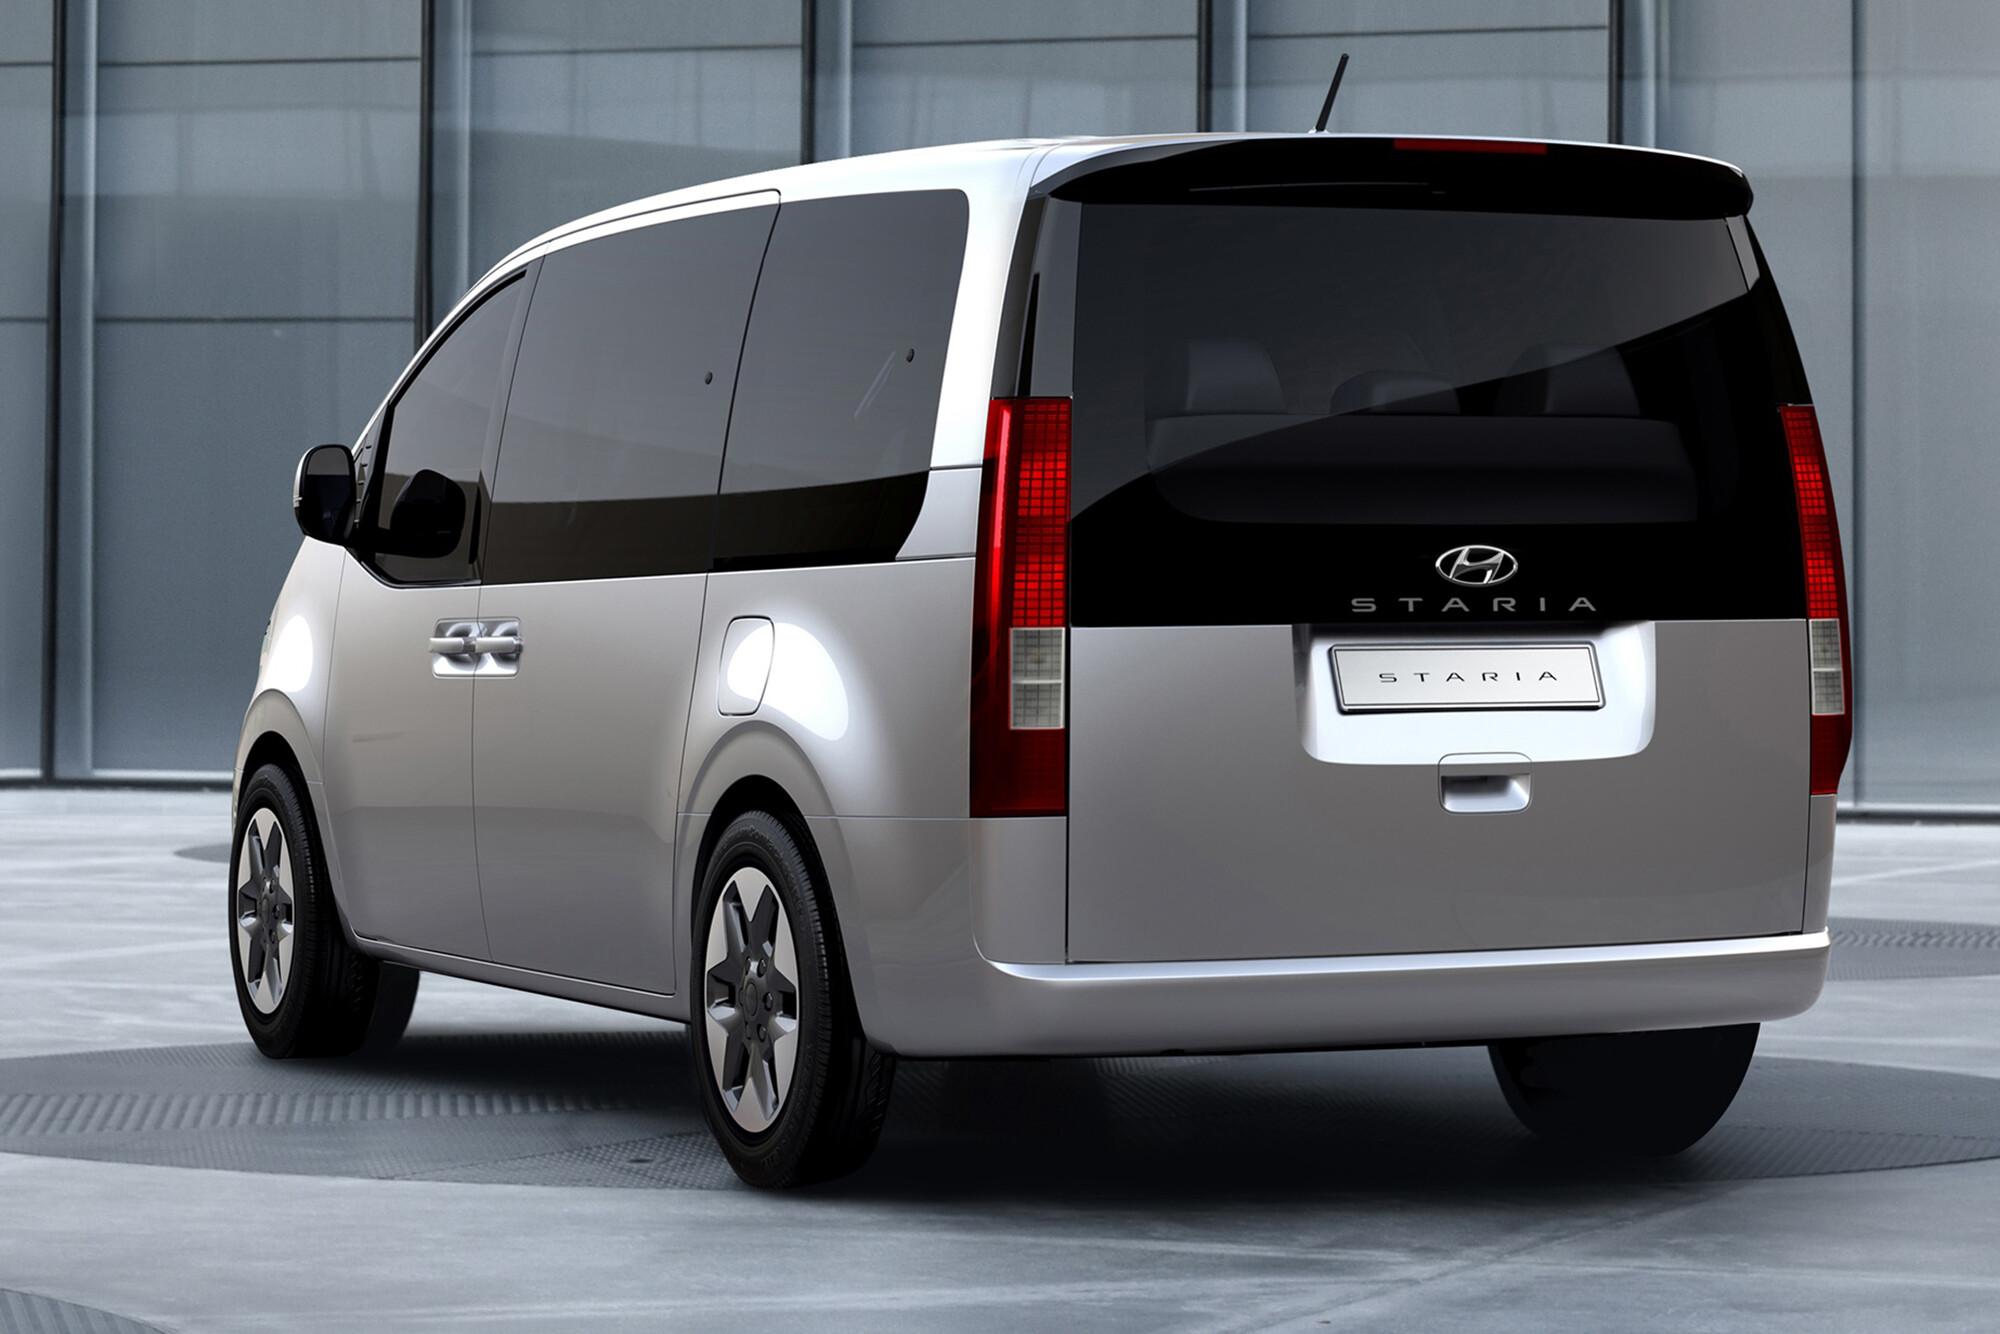 2022 Hyundai Staria Design Revealed 2 Jpg